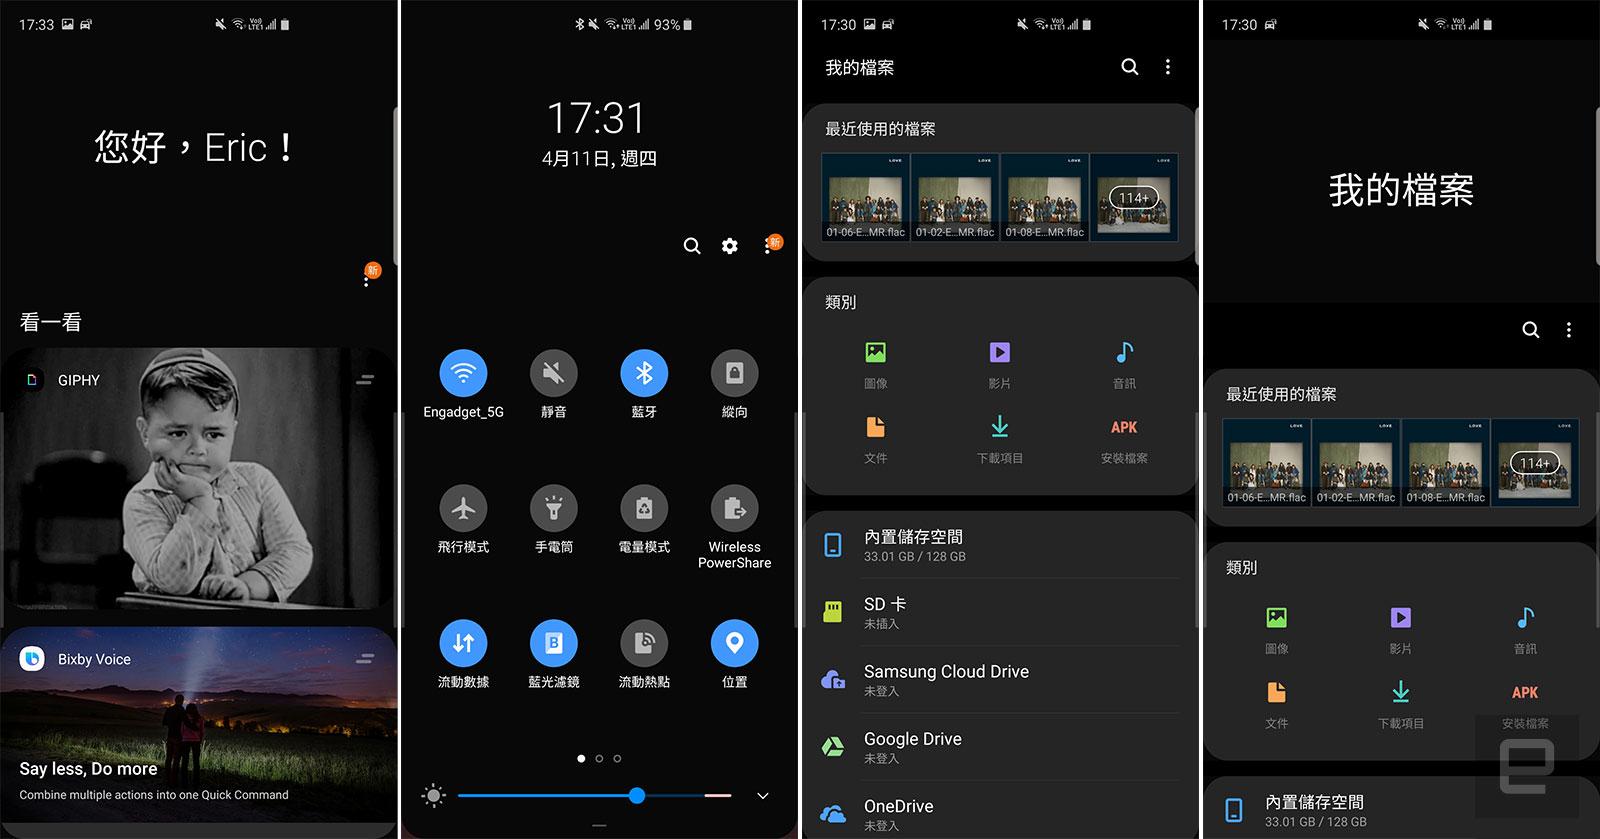 Samsung Galaxy S10+ screen cap